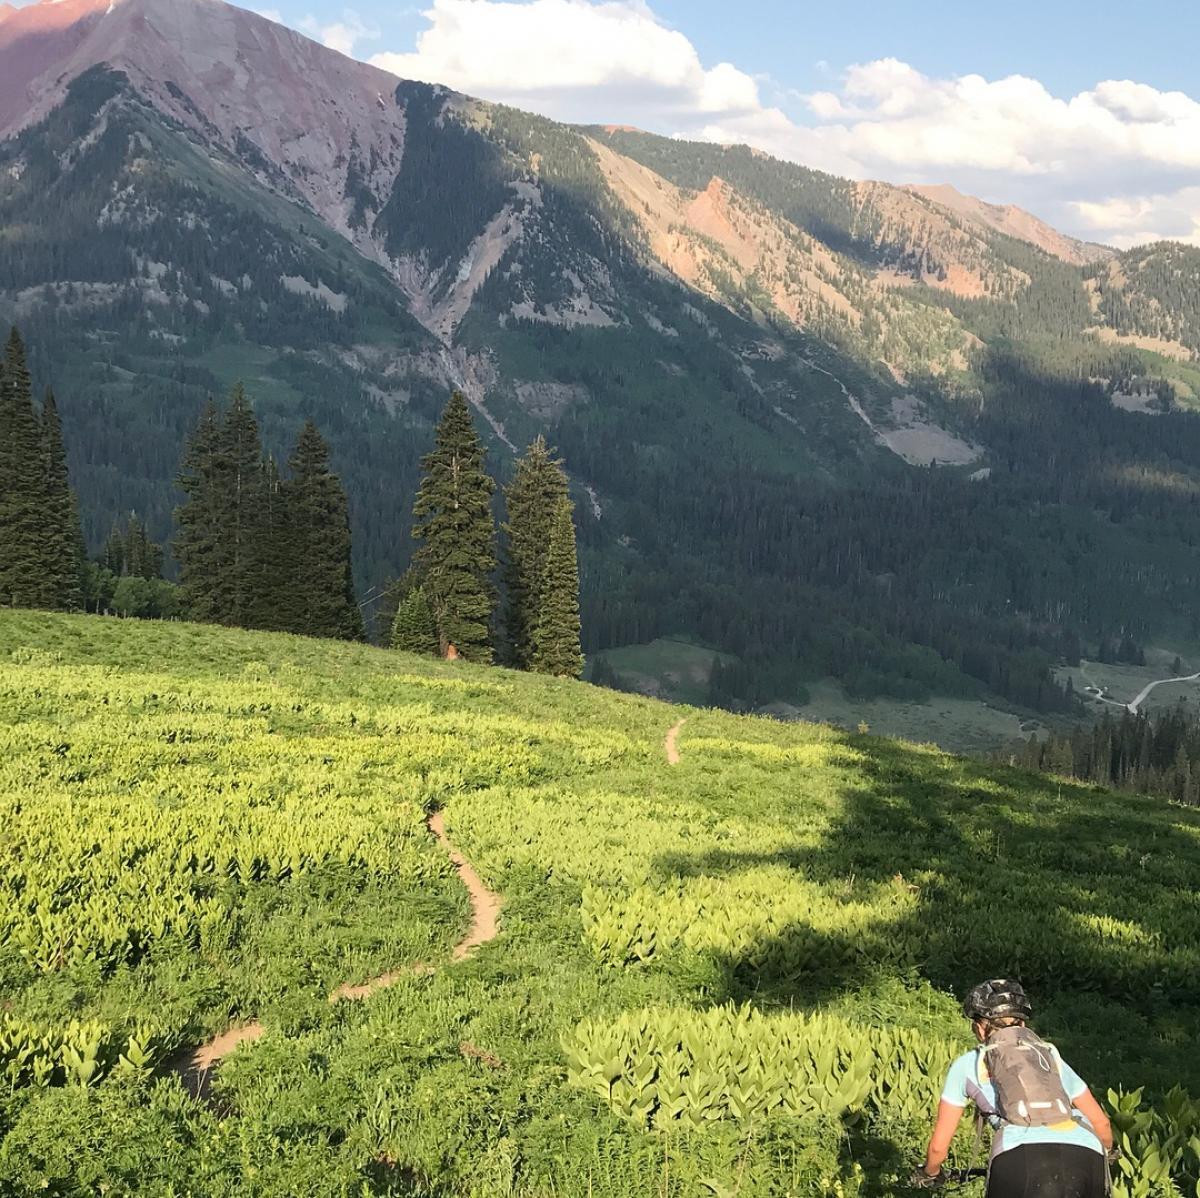 Trail 403 / Washington Gulch